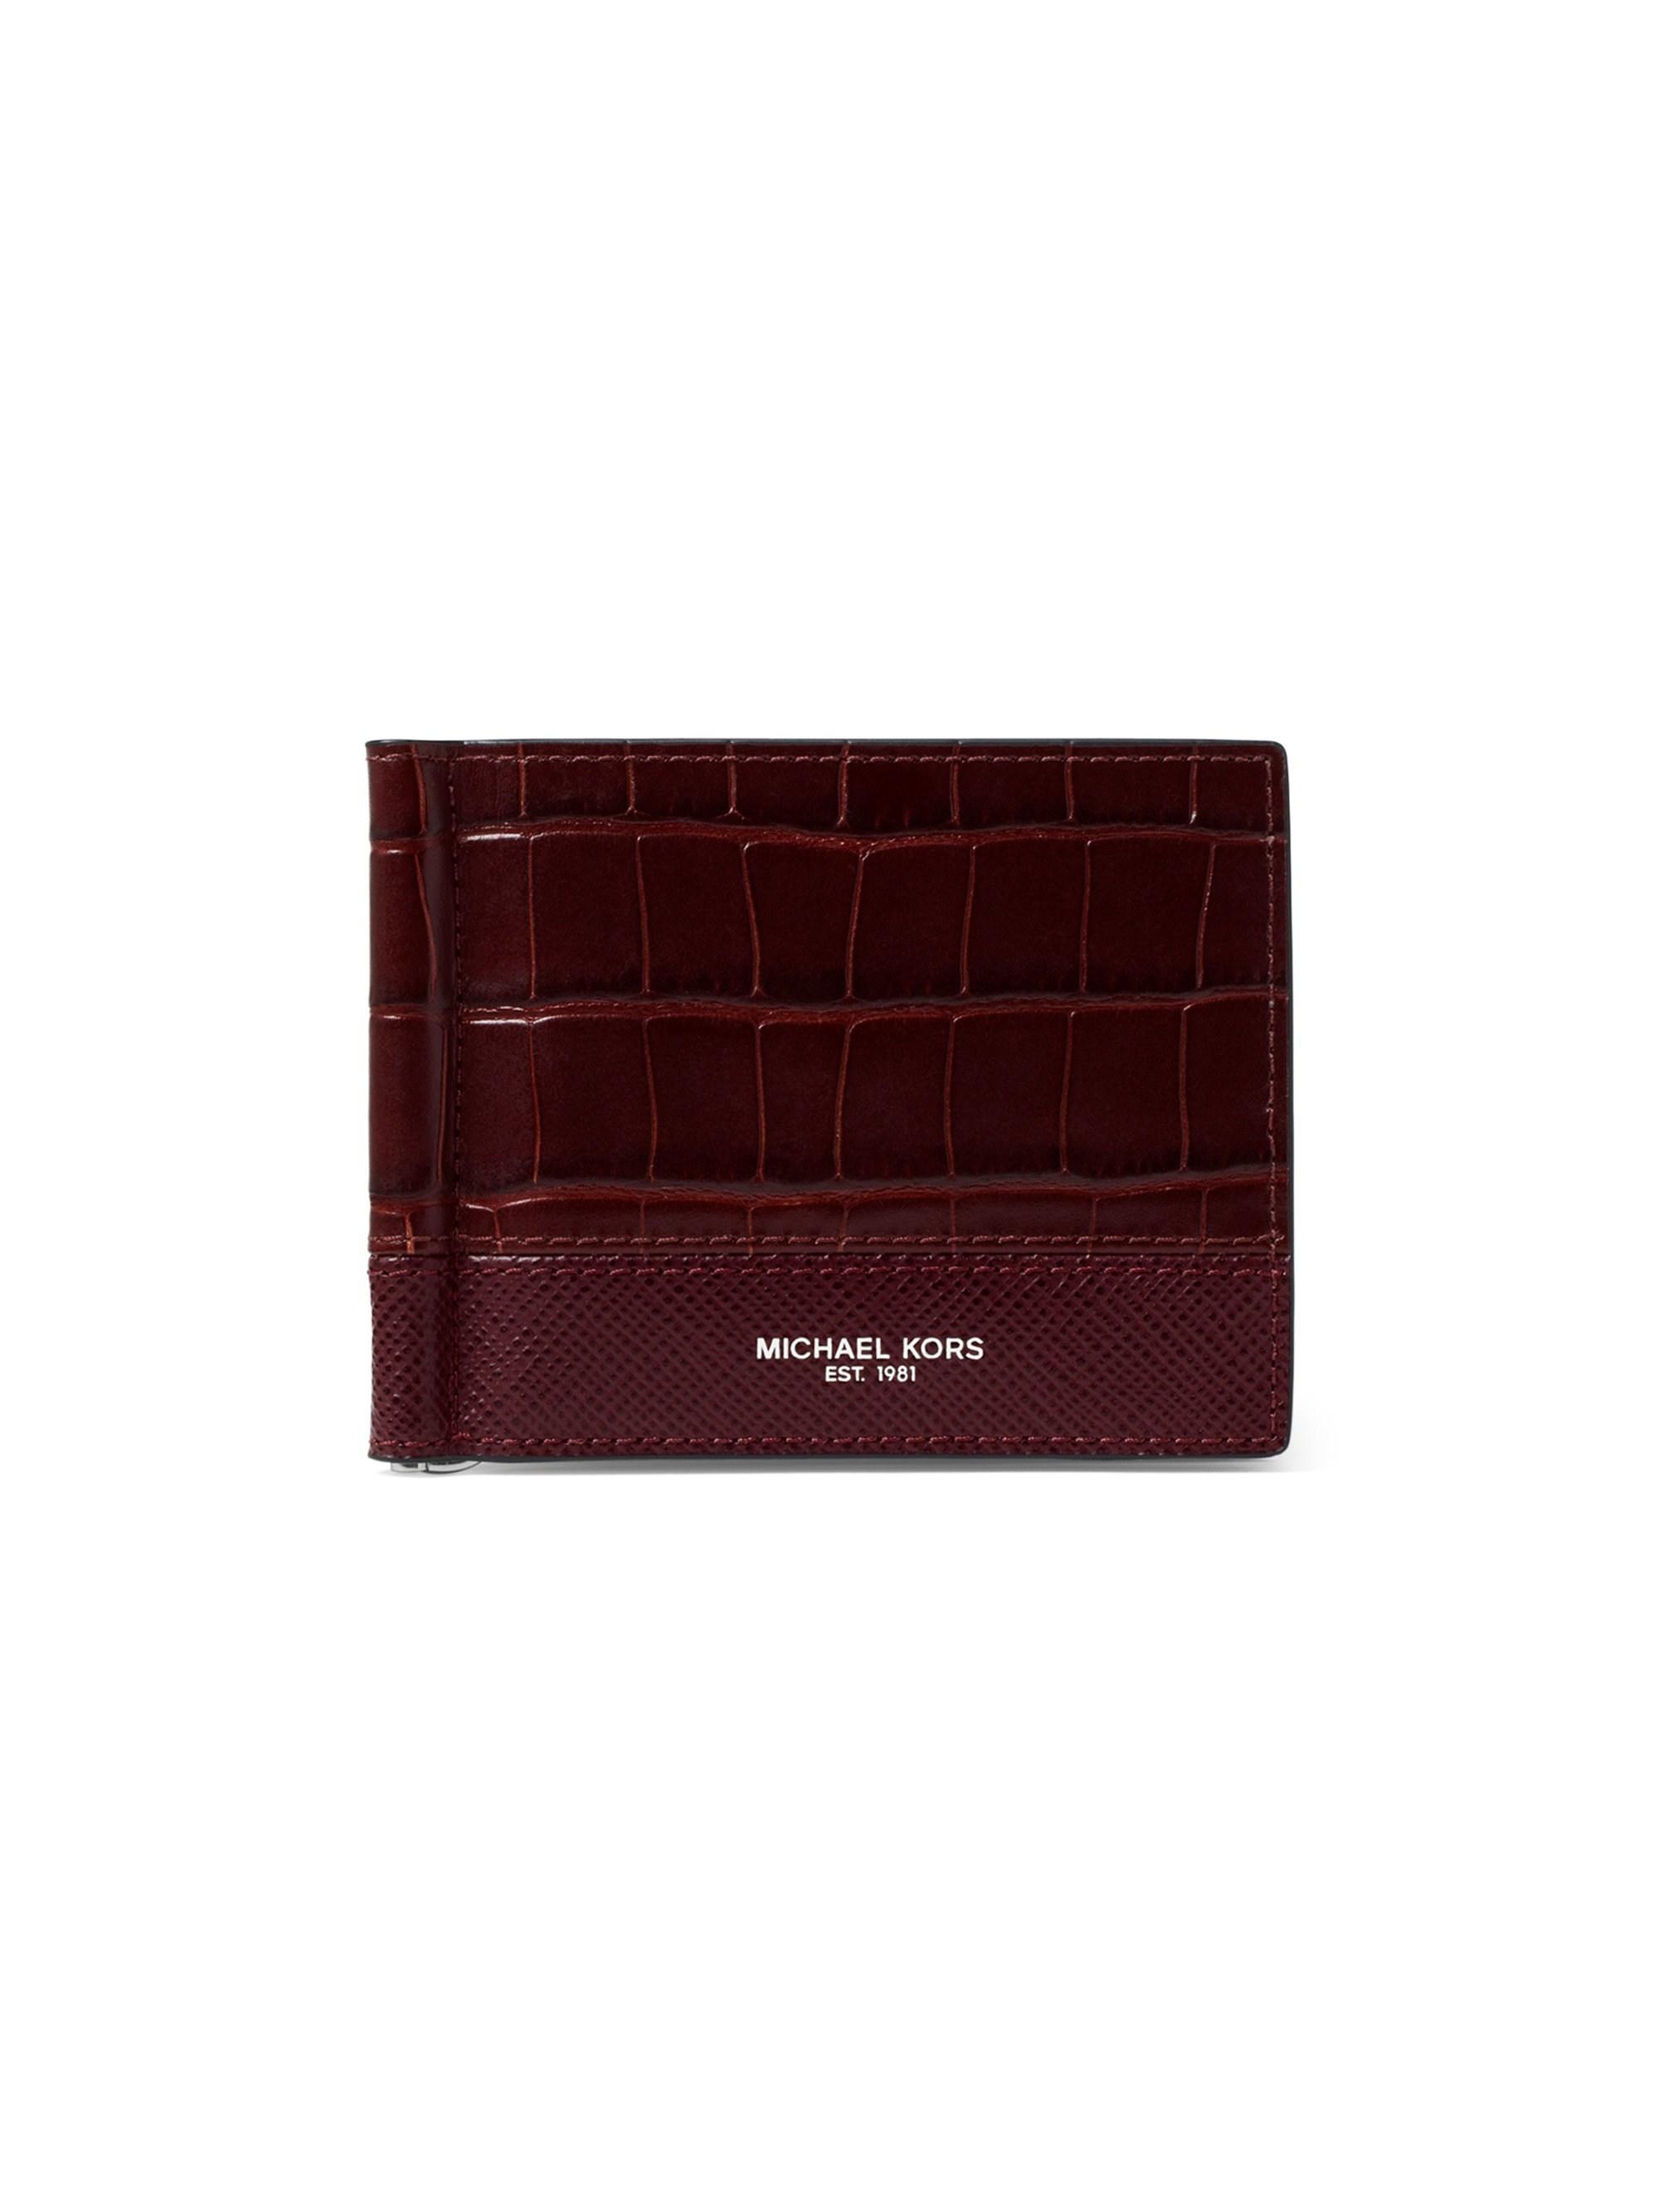 67b940b8c8aa Lyst - Michael Kors Men s Harrison Croc-embossed Leather Money Clip ...